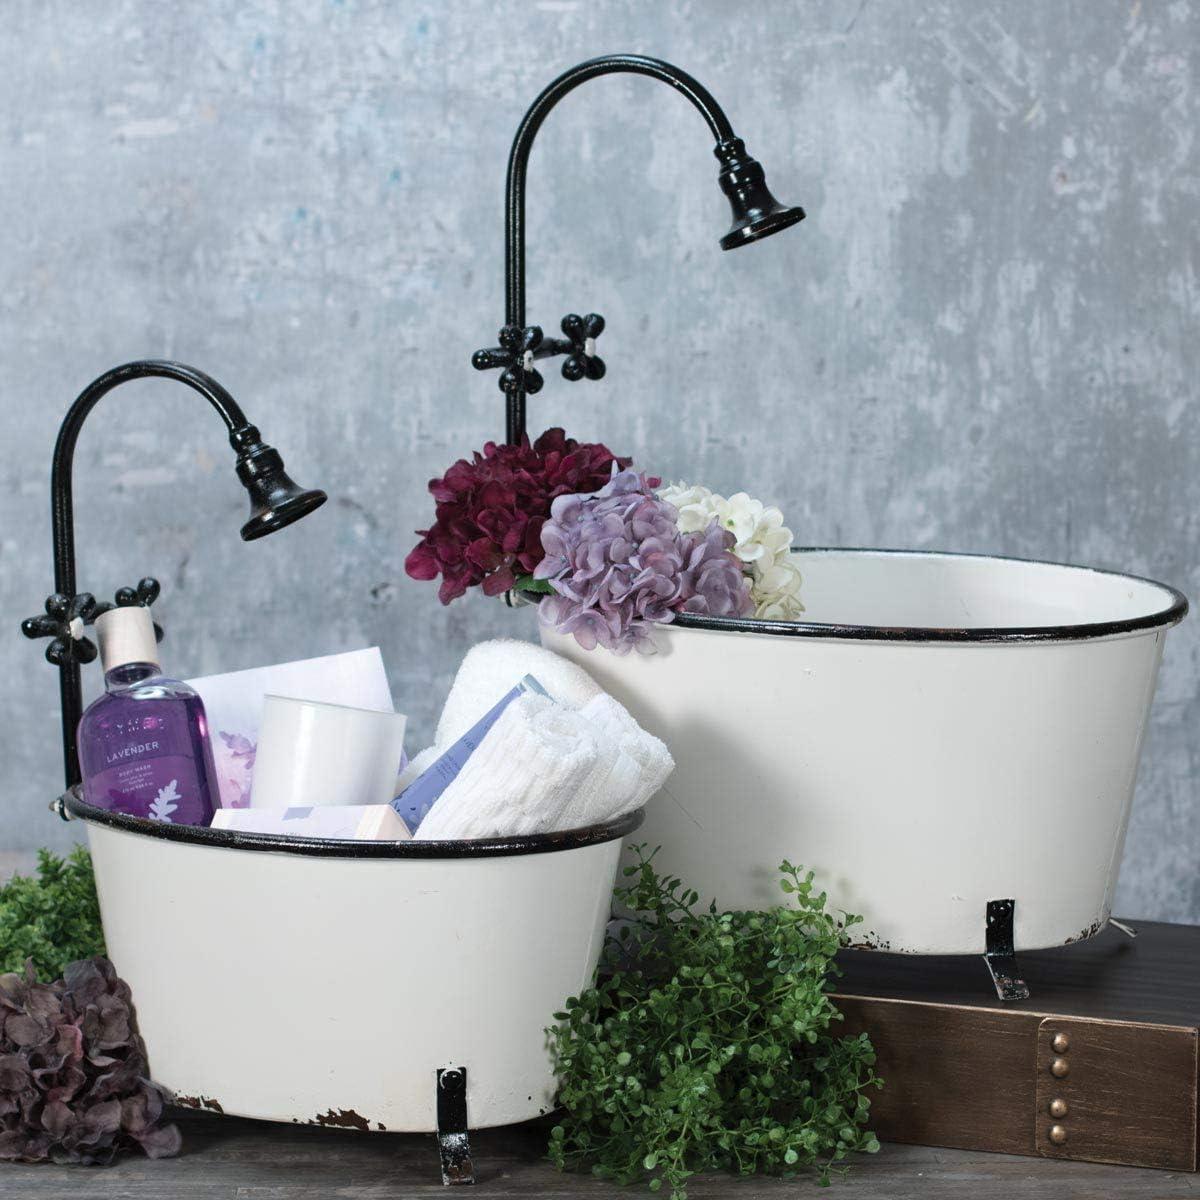 Foreside Distressed Black Rim White Enamel Bathtub Planters, 2 Piece